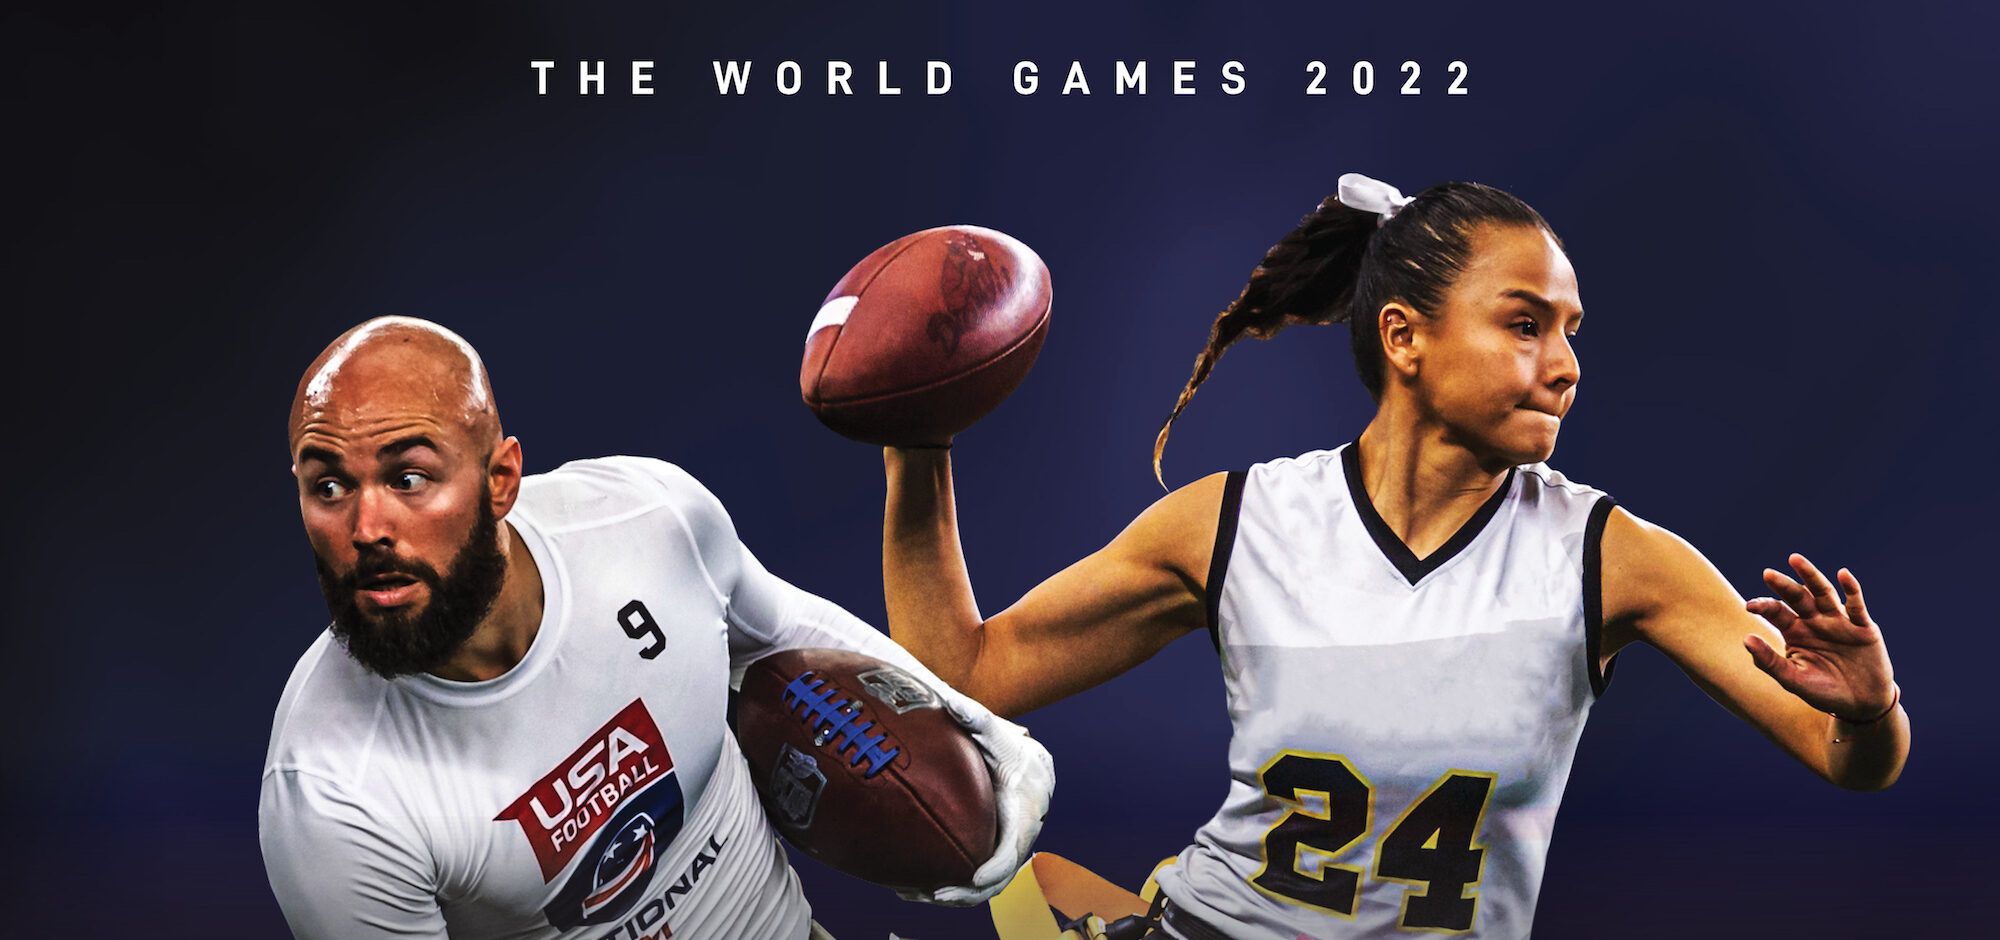 World Games 2022 Birmingham